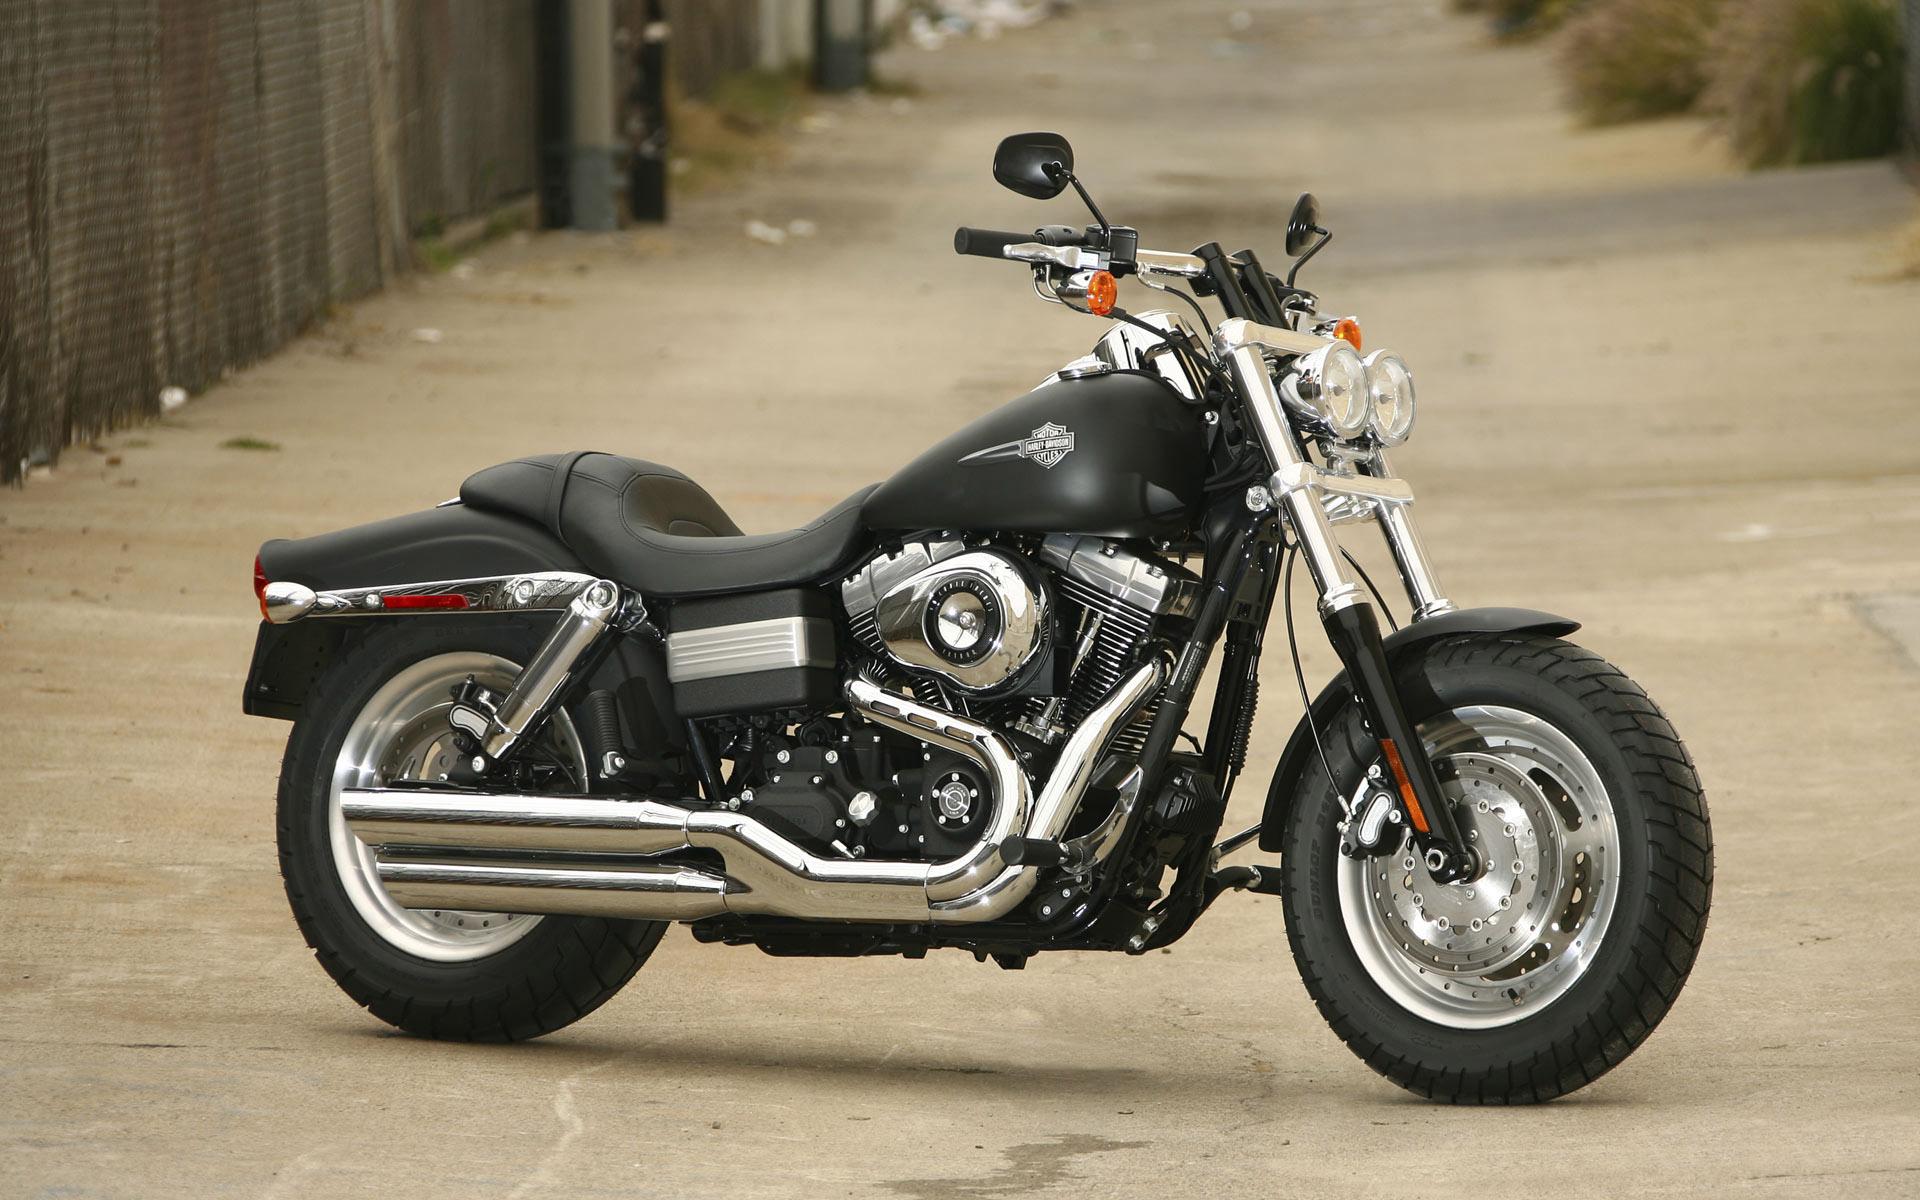 Harley Davidson HD wallpaper 1920 x 1200 pictures 57jpg Harley 25jpg 1920x1200